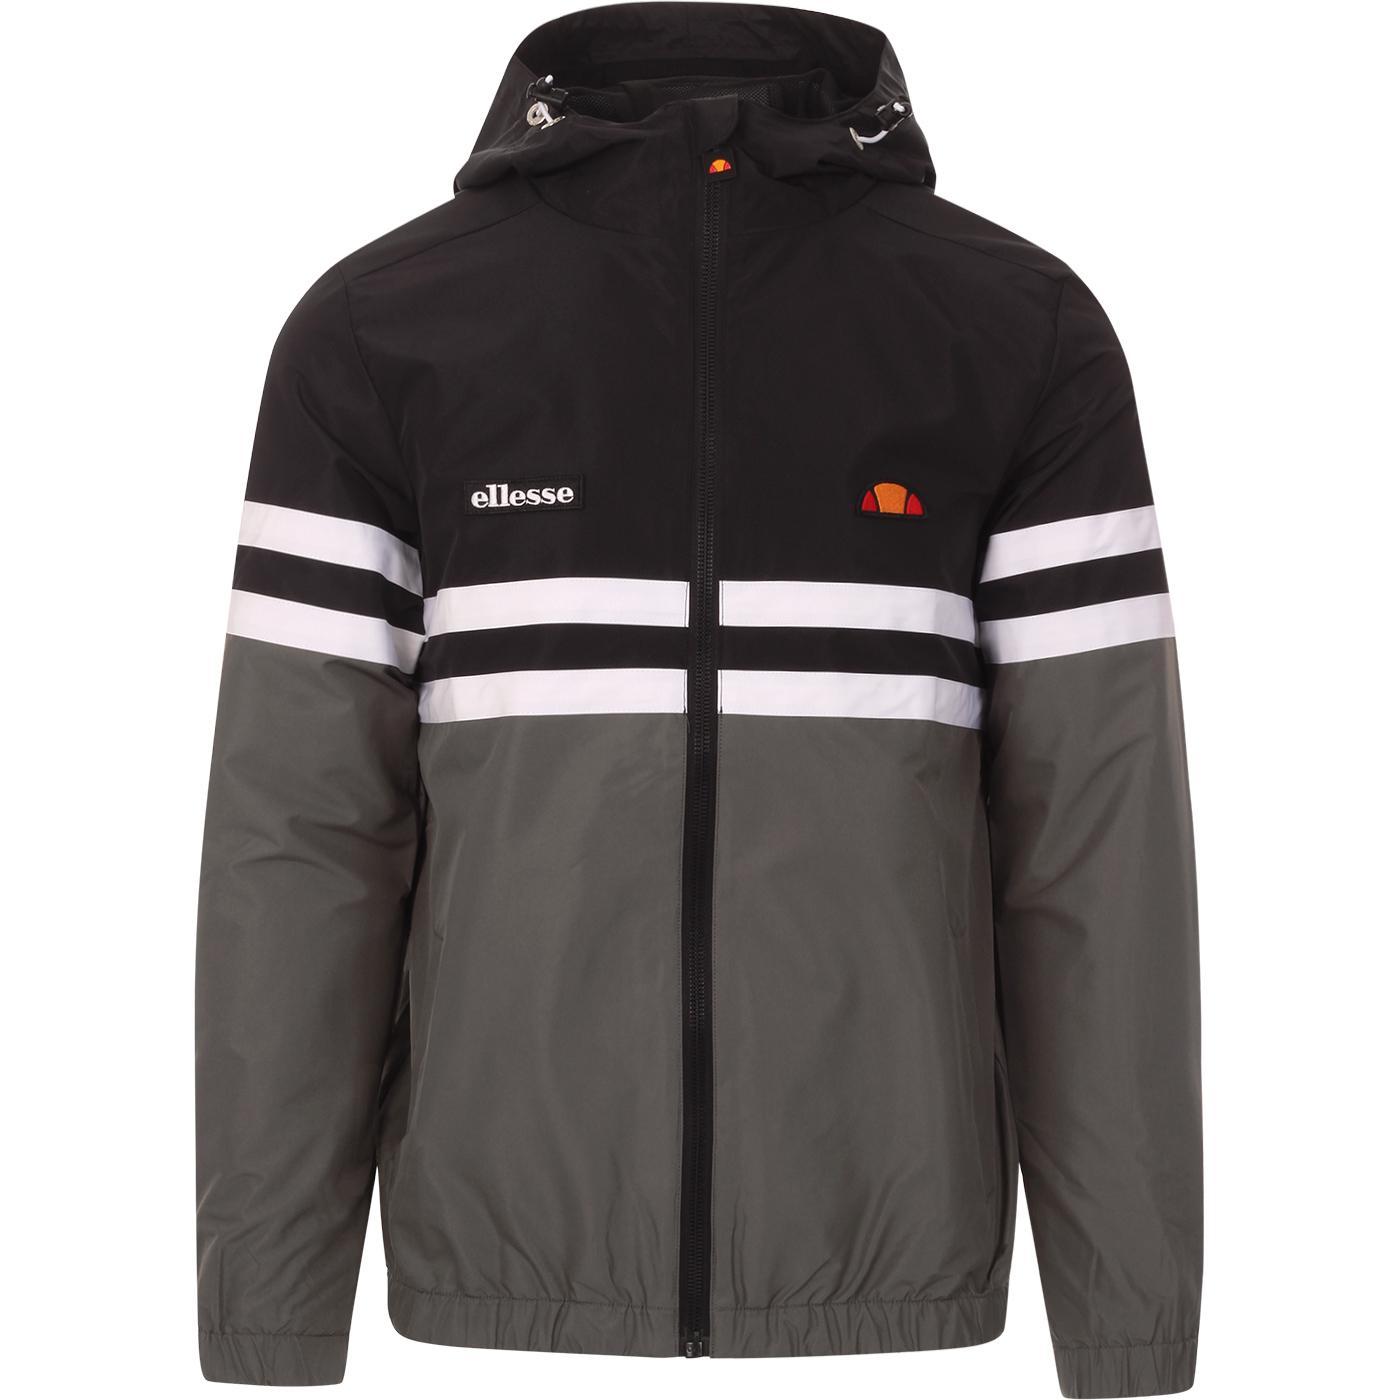 Carpio ELLESSE Retro Hooded Windrunner Jacket (B)